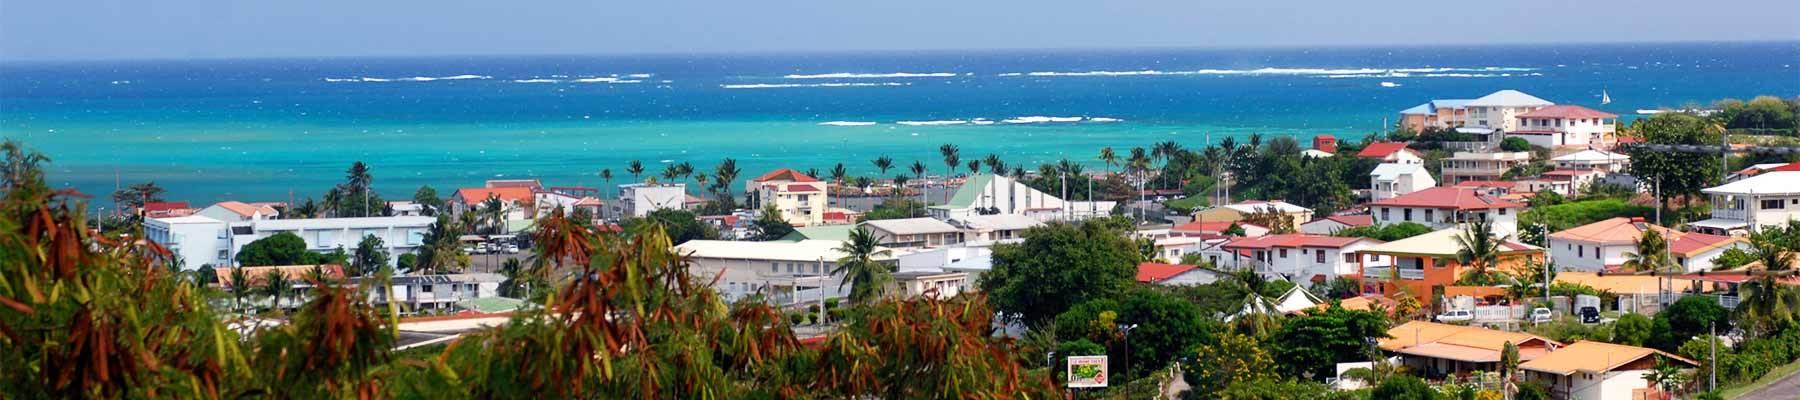 Photo 2: Stage de kitesurf à l'UCPA - la pointe faula - Martinique